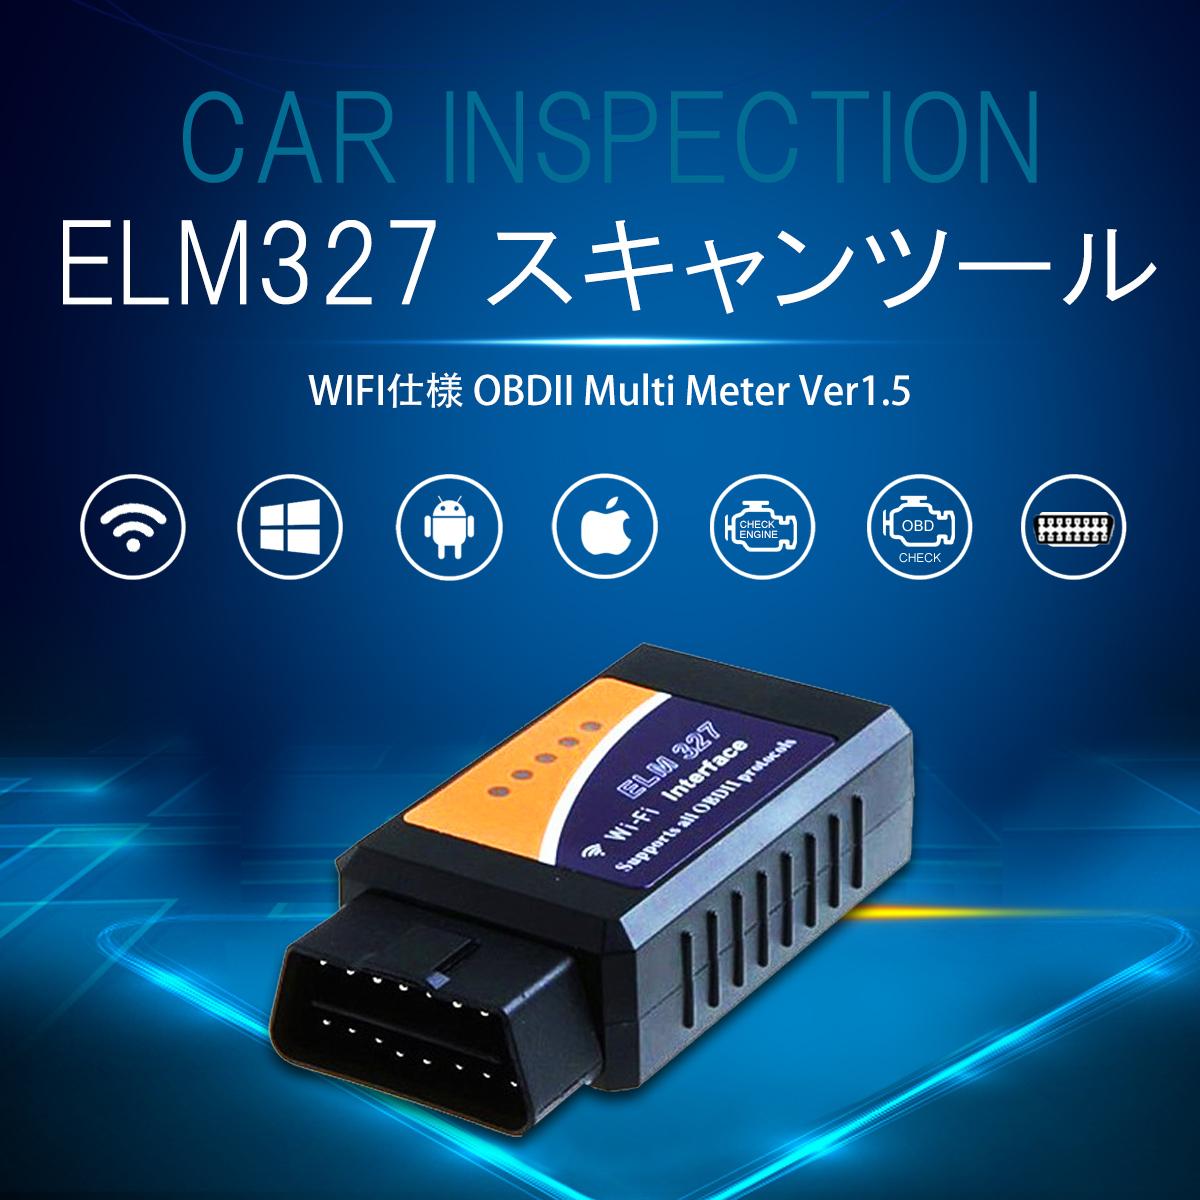 ELM327 WiFi OBD2汎用スキャンツール V1.5 iPhone iPad Android PC対応 カー情報診断ツール OBDII マルチメーター SDM便送料無料 1ヶ月保証